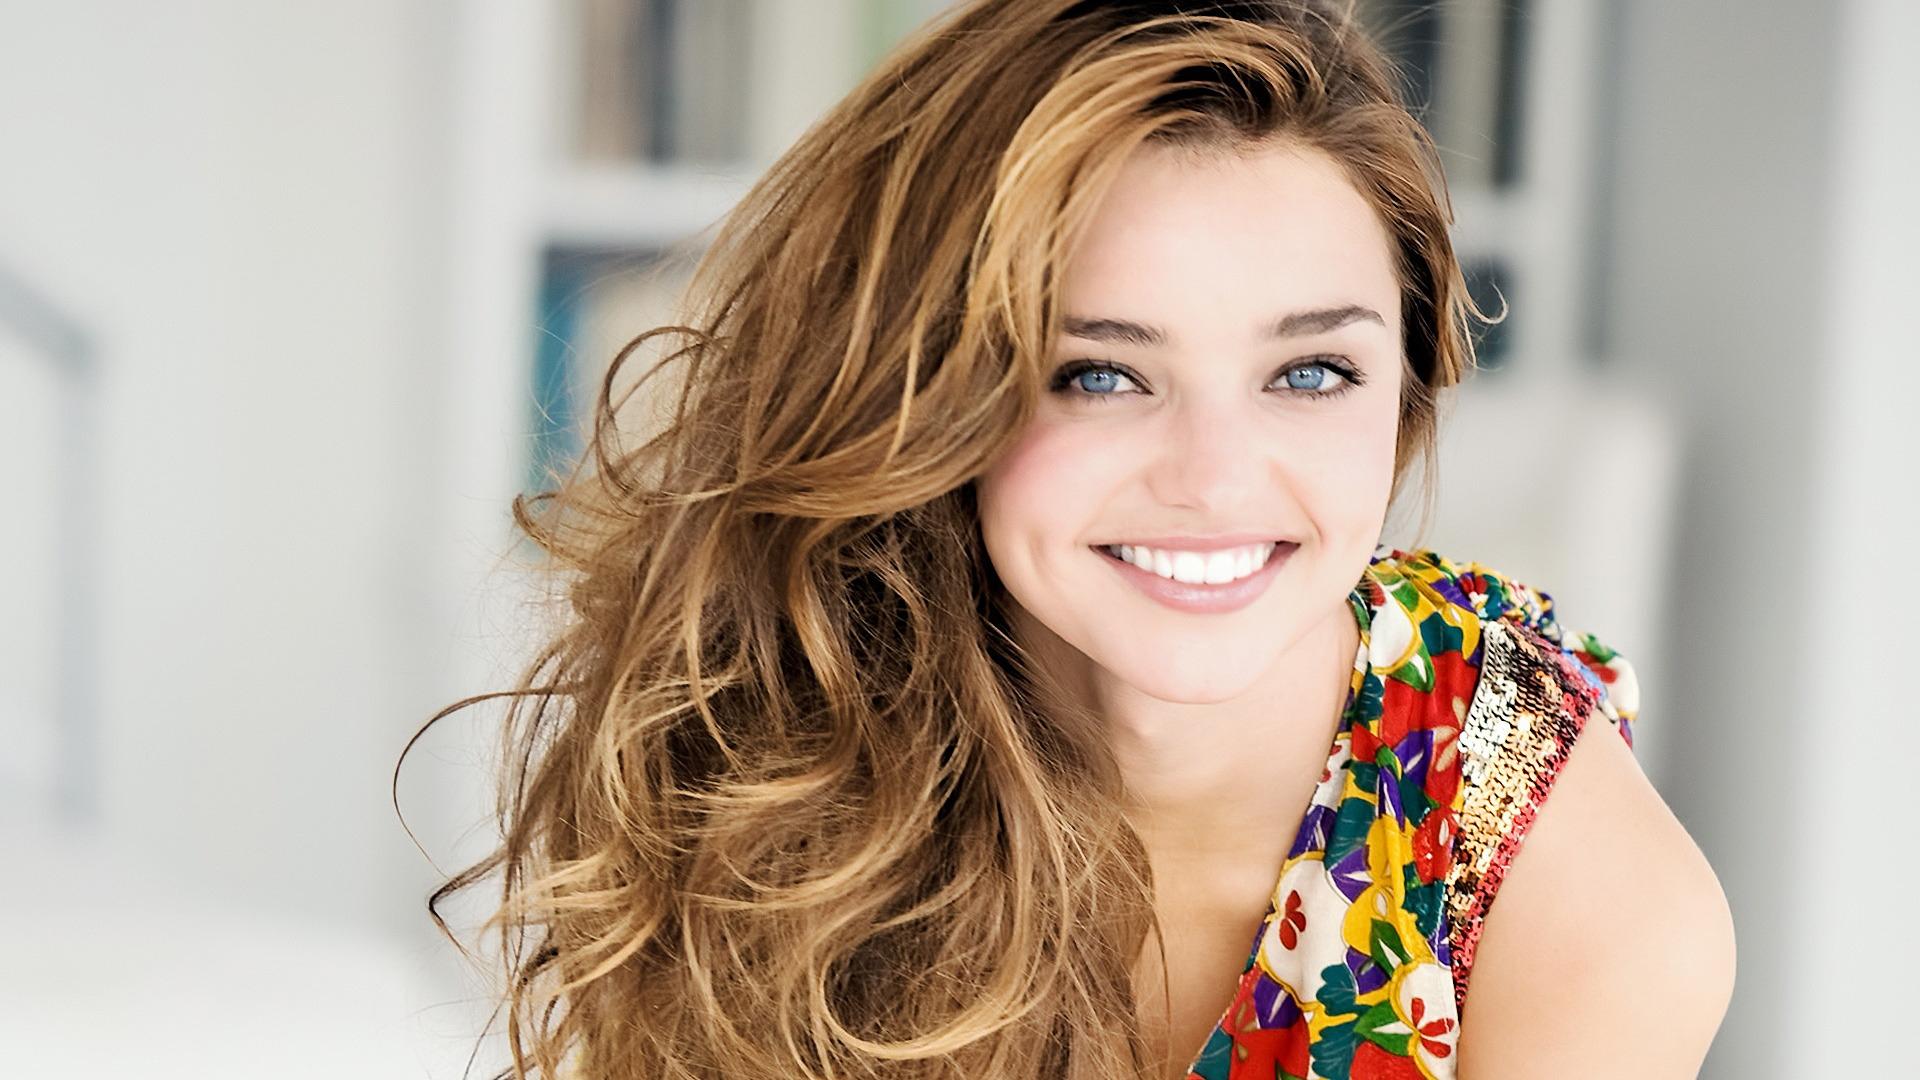 Happy Miranda Kerr Australian Model Wallpaper